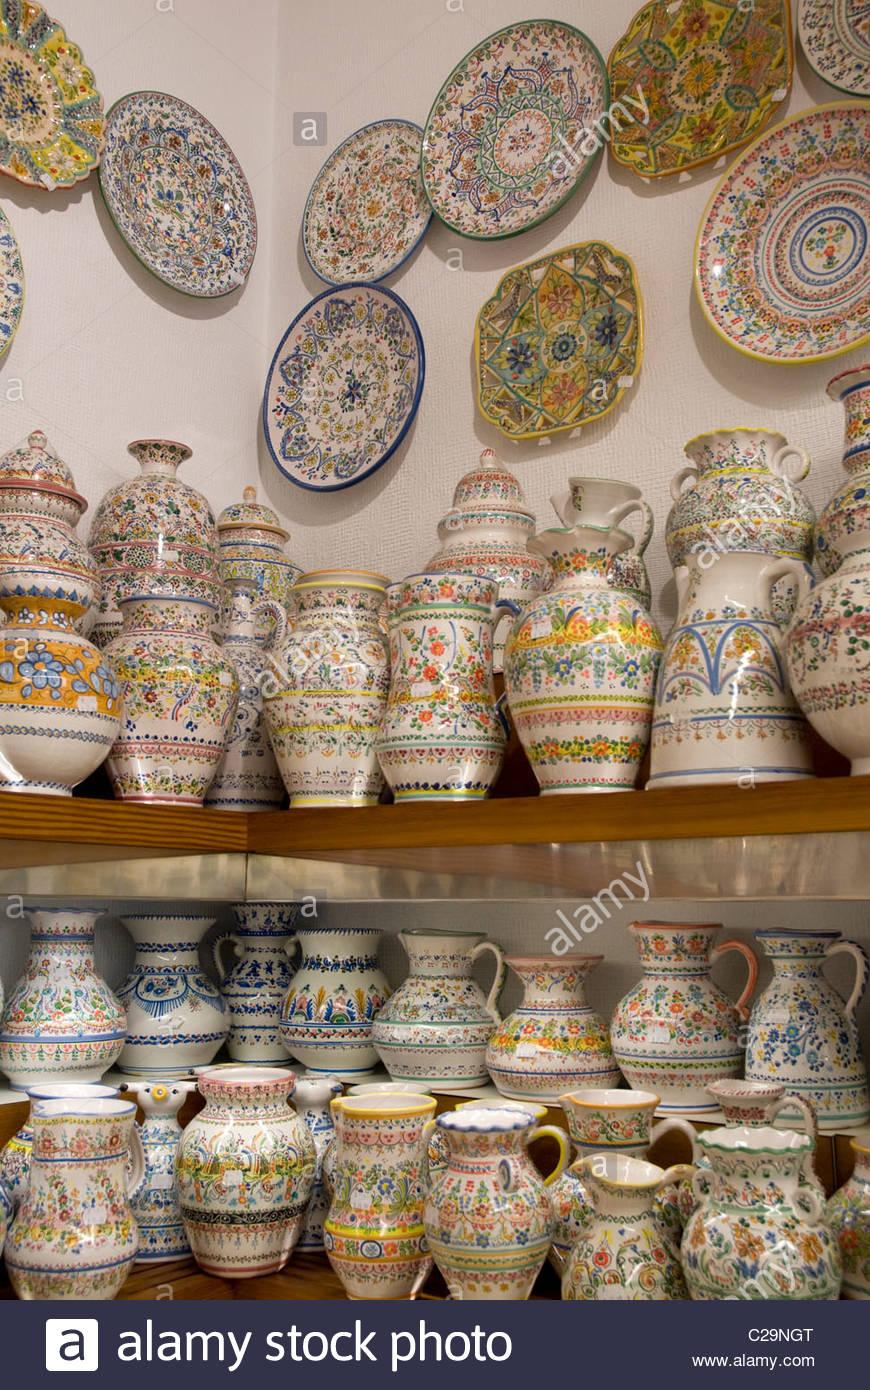 Ceramics display at Martian Ceramica Sevilla on Calle Sierpes. - Stock Image